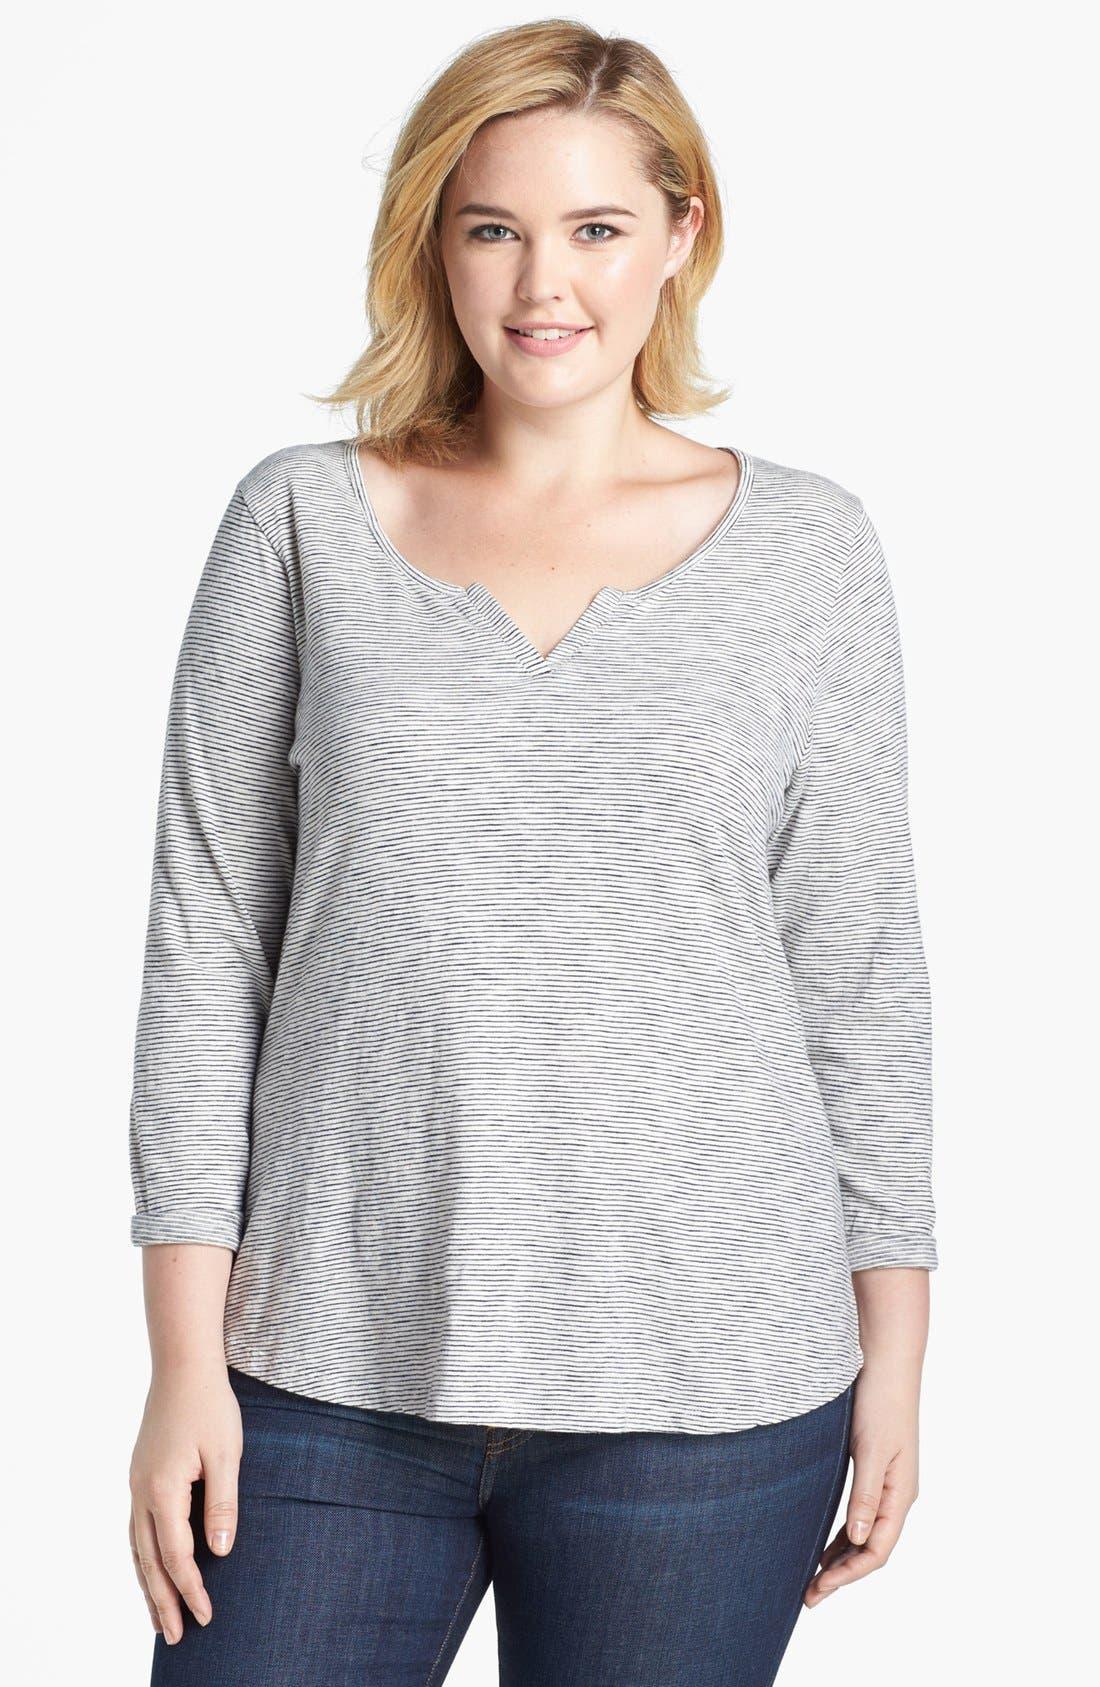 Alternate Image 1 Selected - Lucky Brand Mini Stripe Cotton Top (Plus Size)